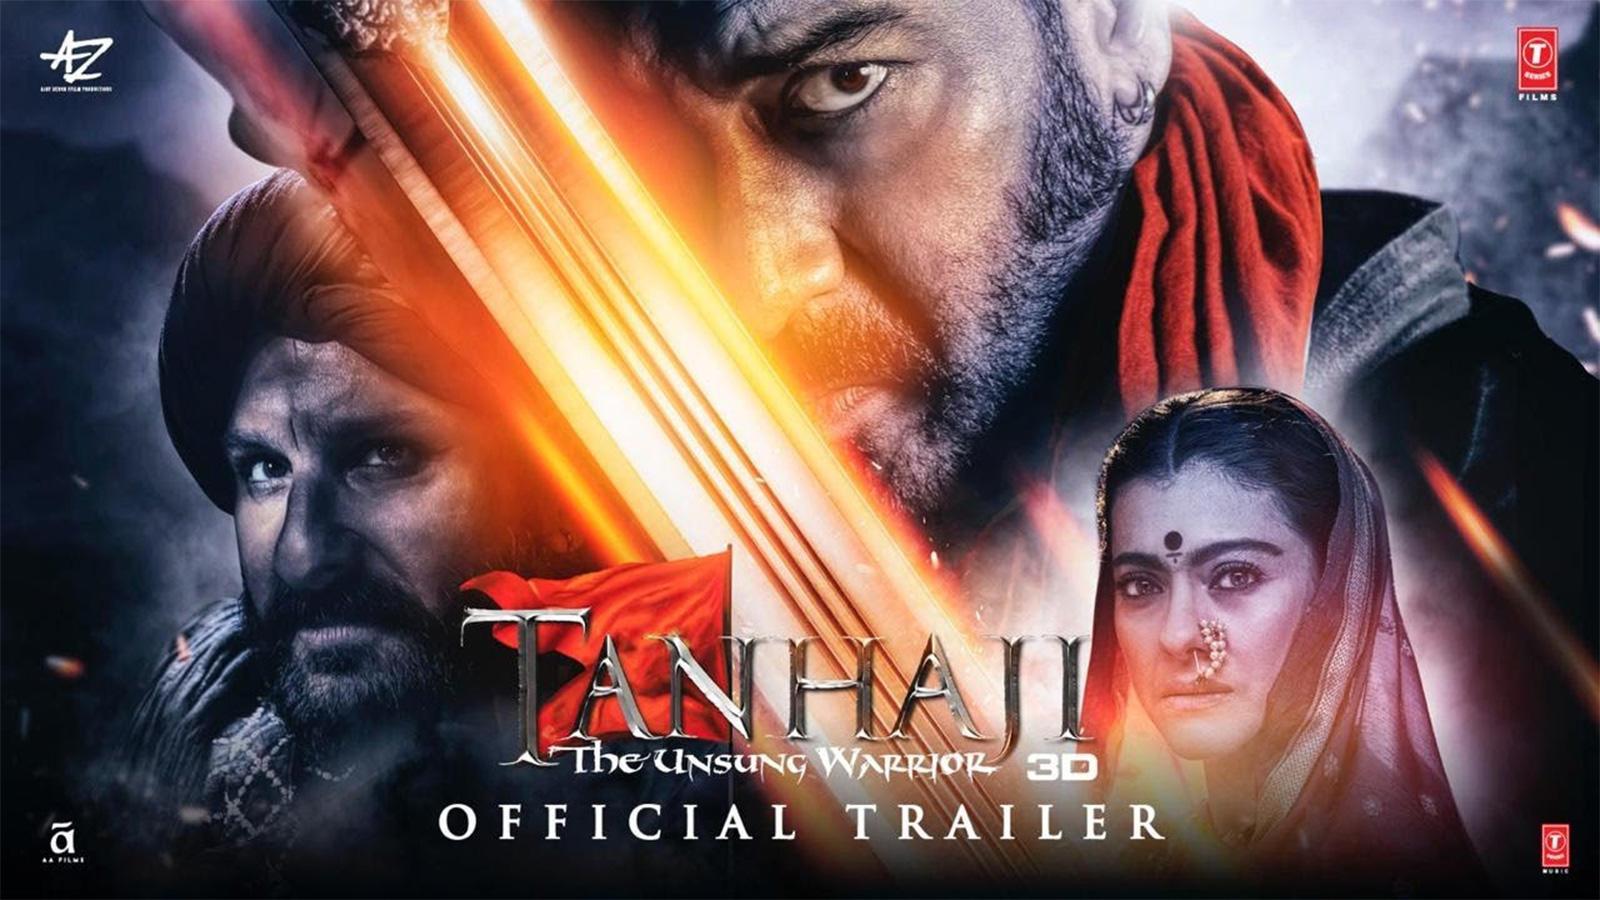 tanhaji-the-unsung-warrior-official-trailer